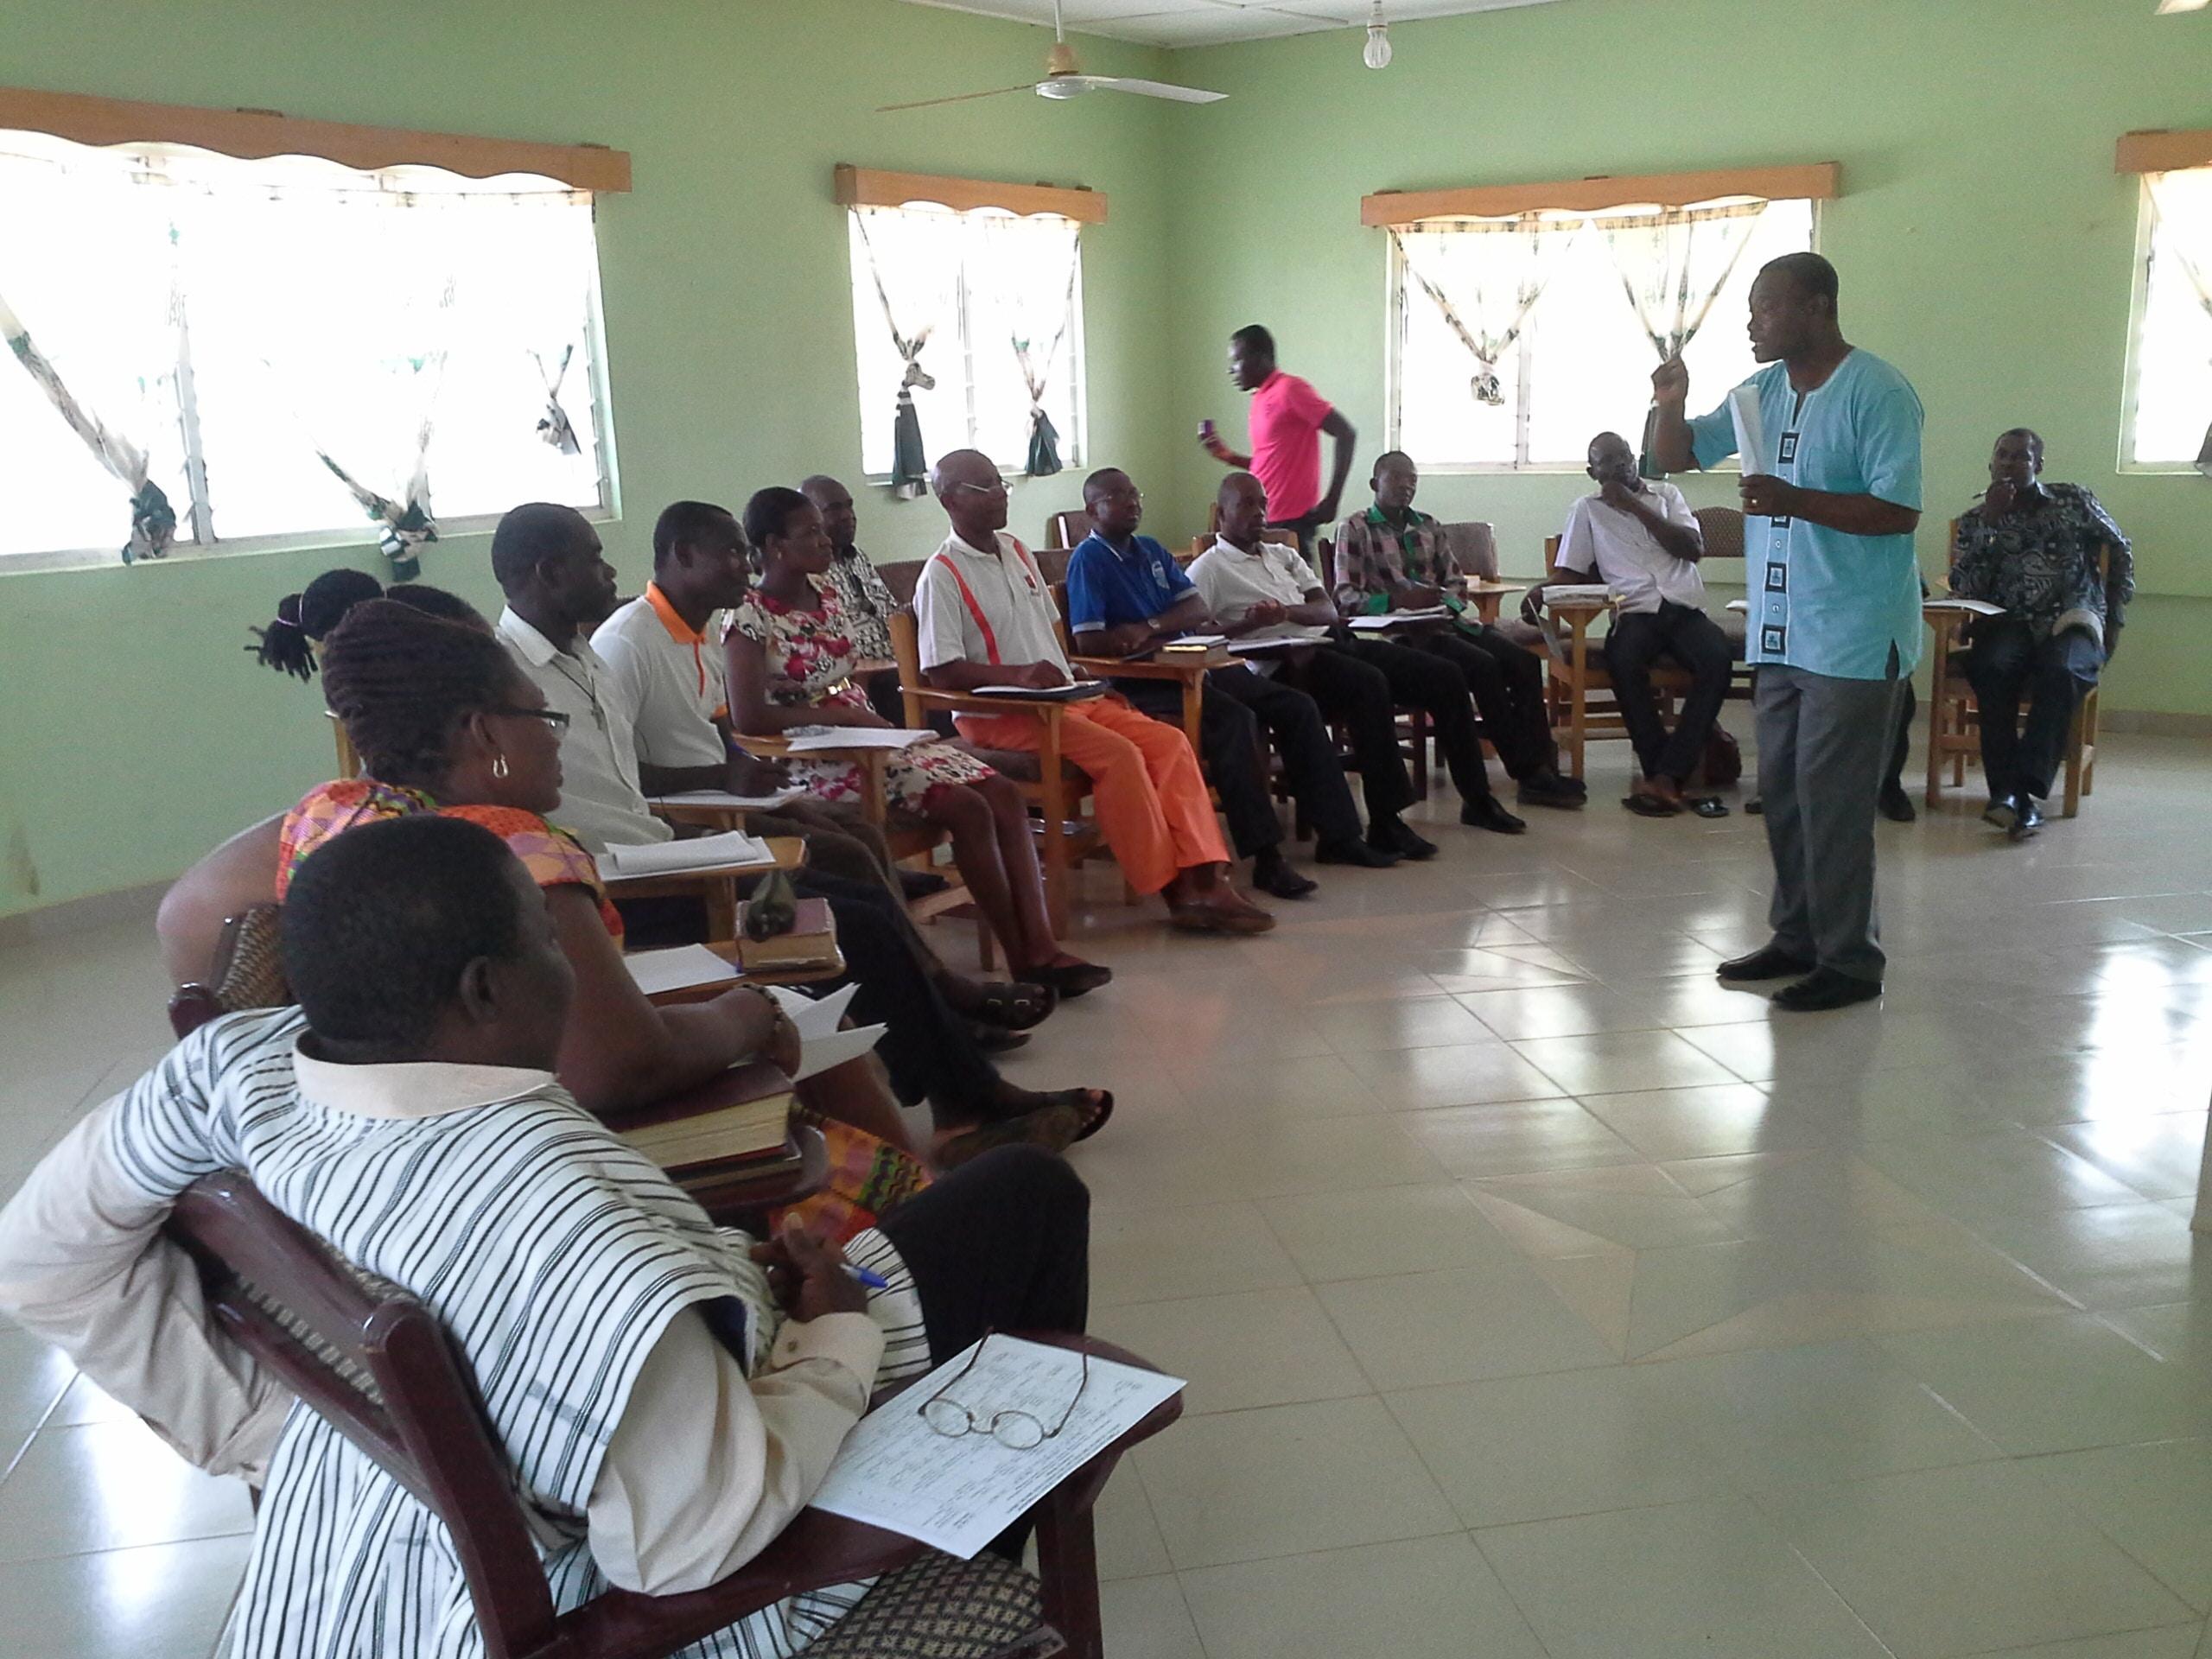 LITERACY PROGRAM FOR THE DAGAARE COMMUNITY